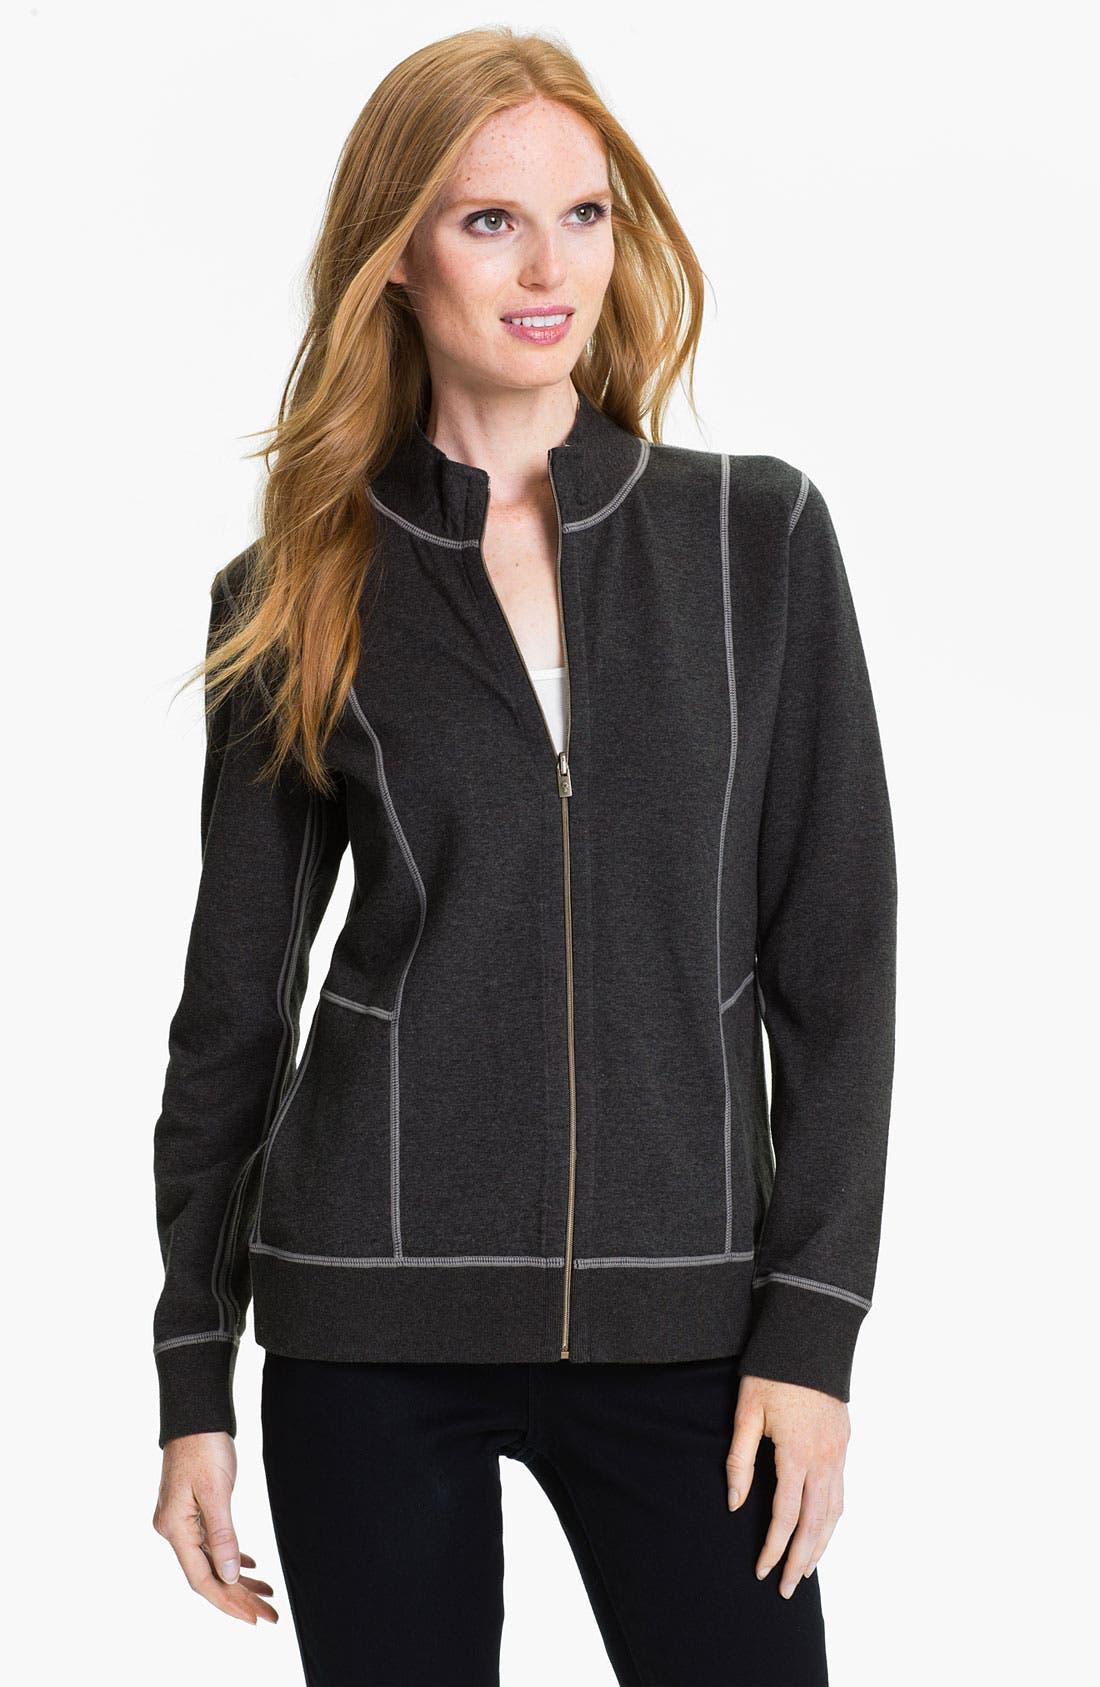 Alternate Image 1 Selected - Tommy Bahama 'Flip Side' Reversible Jacket